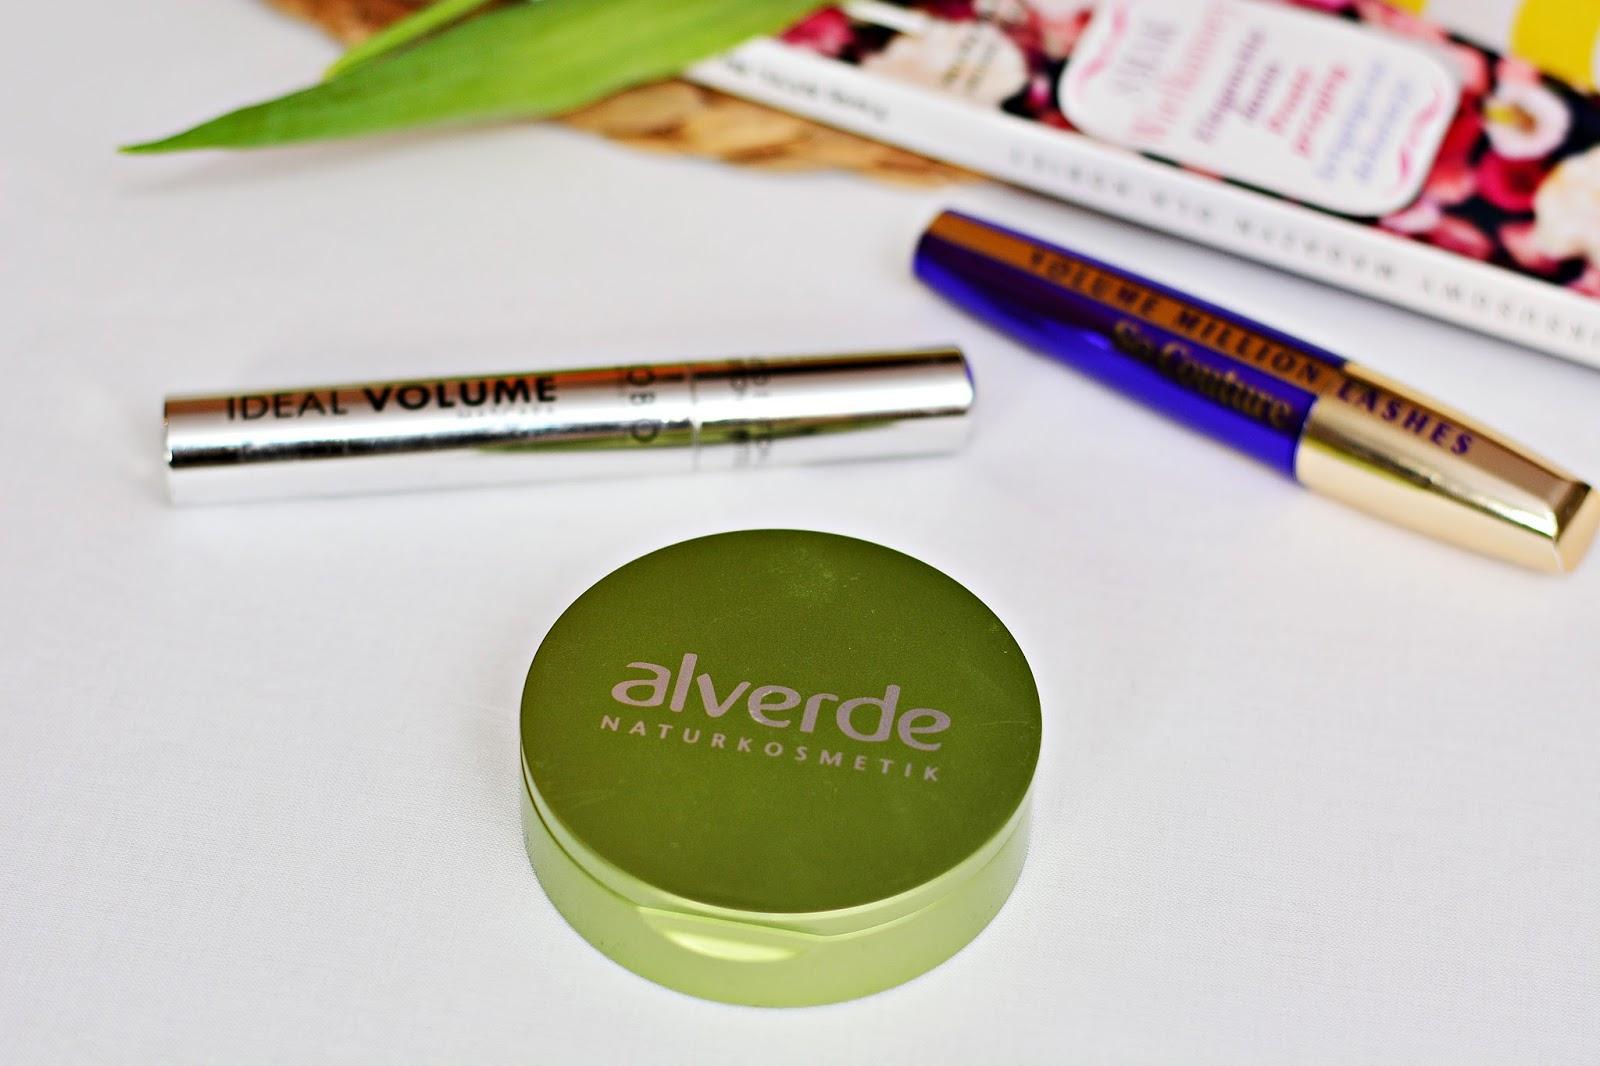 podkład w kompakcie Alverde NATURKOSMETIK Kompakt Make-up